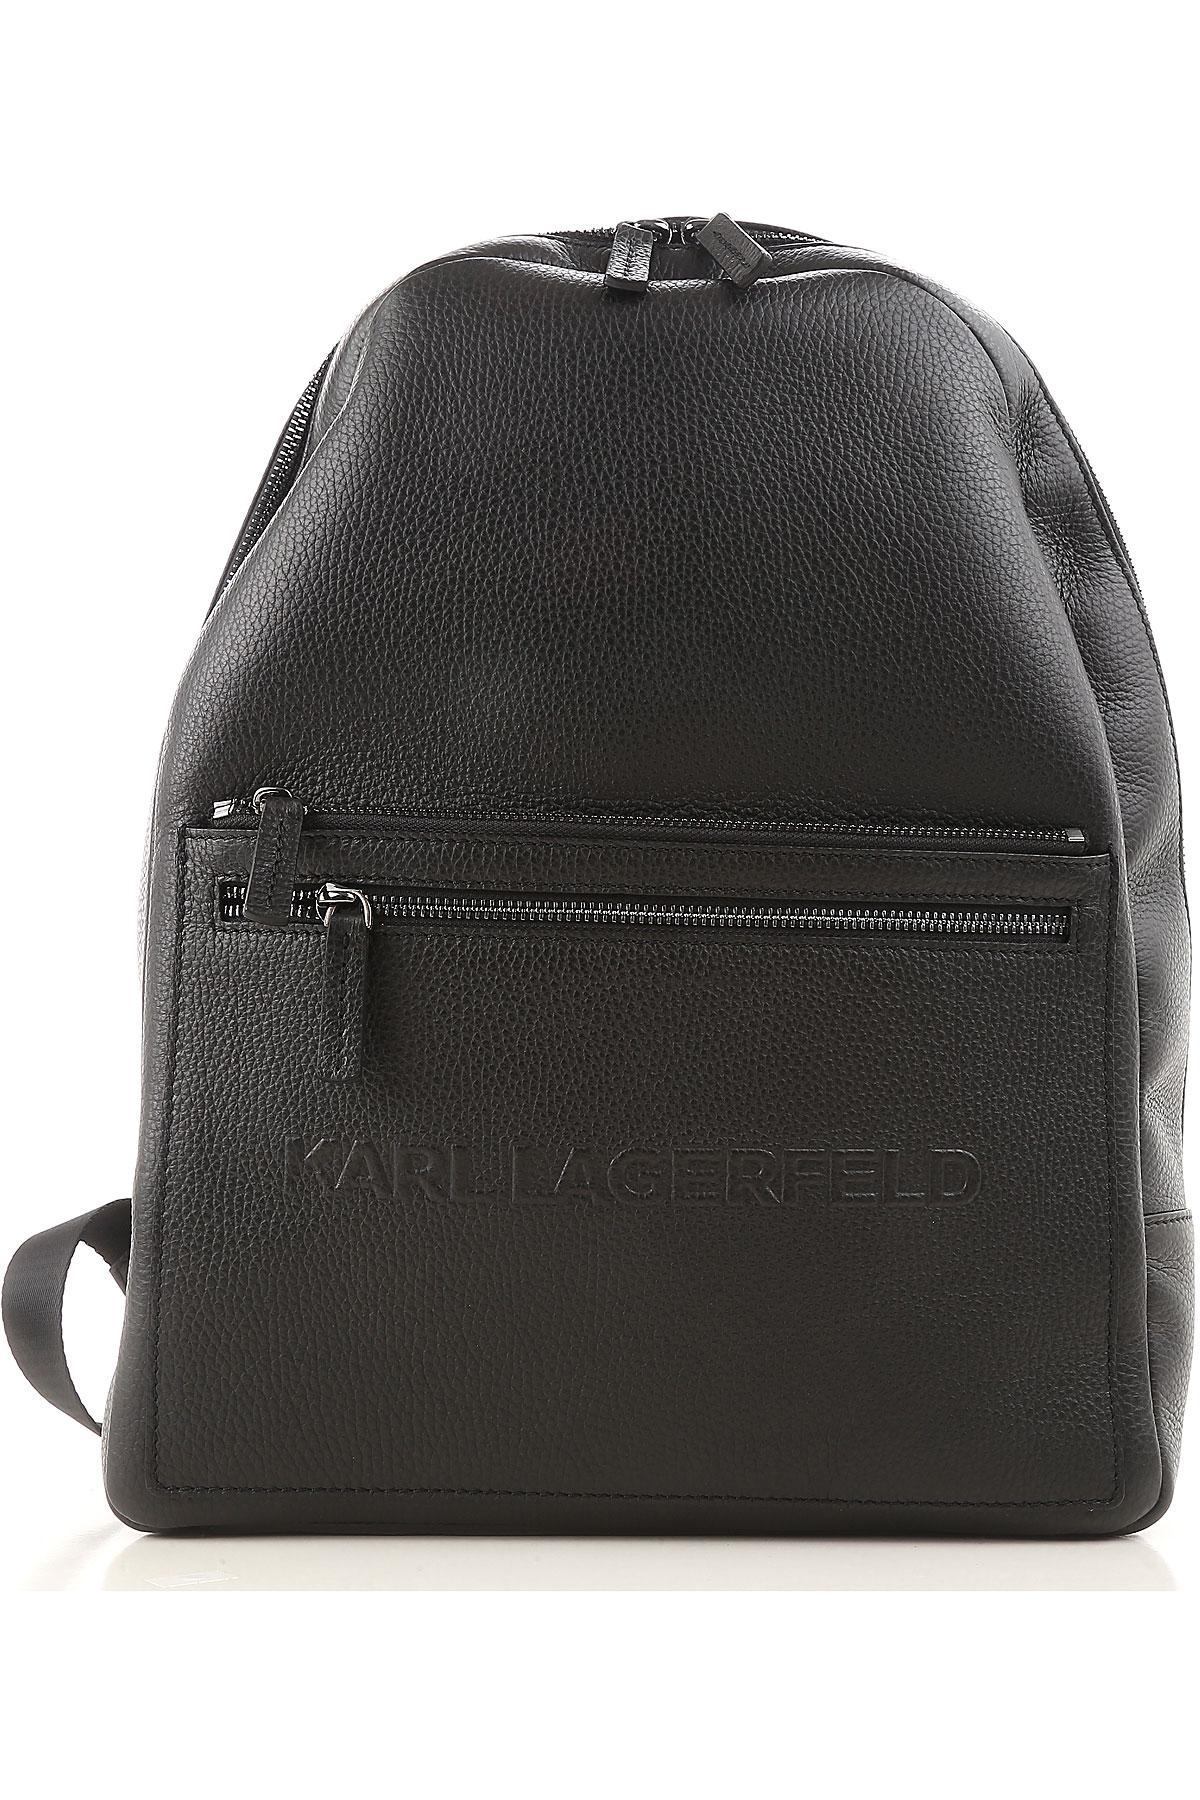 Image of Karl Lagerfeld Backpack for Men, Black, Leather, 2017